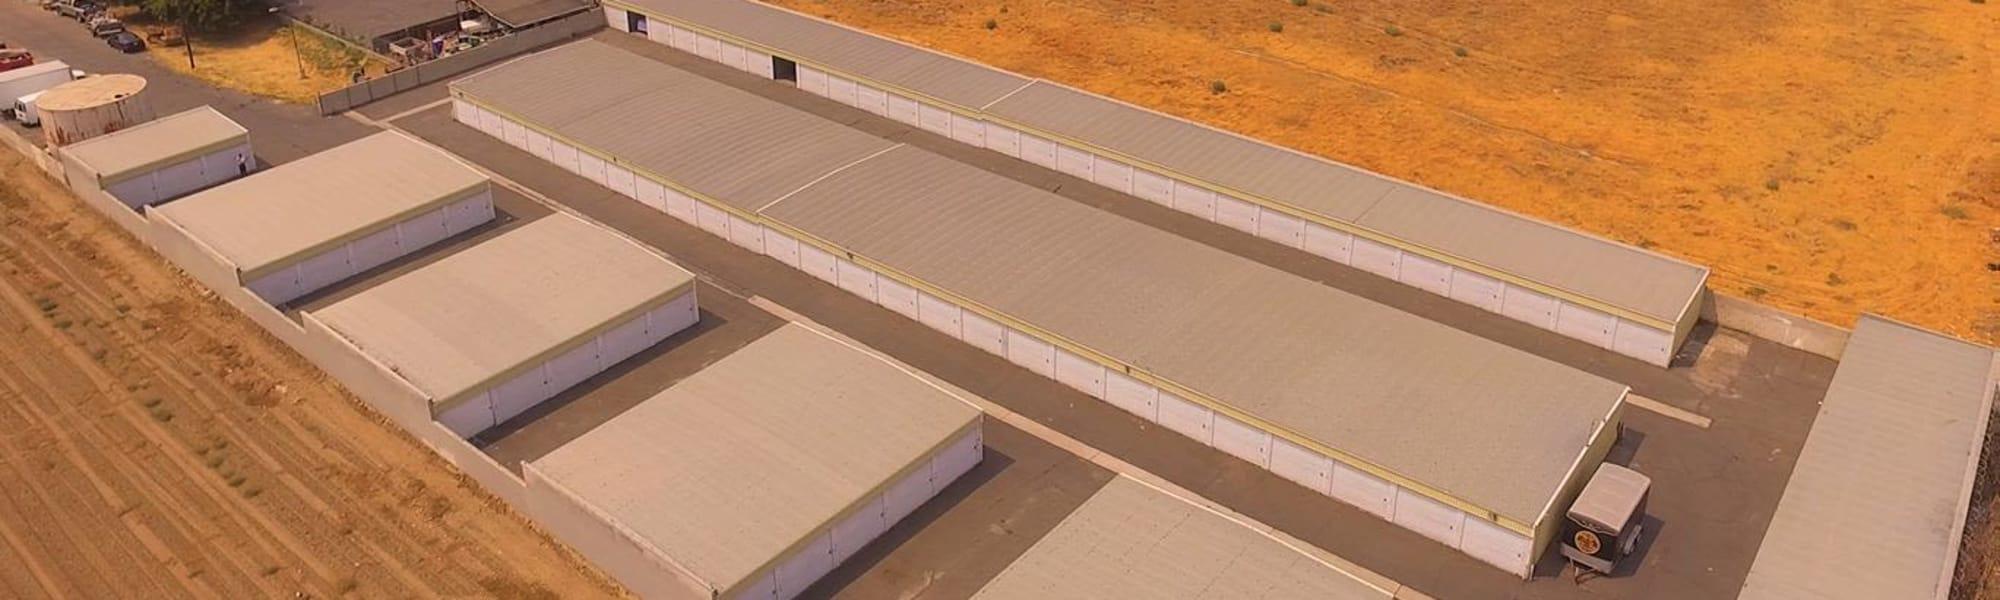 Sierra Vista Mini Storage in Bakersfield, California